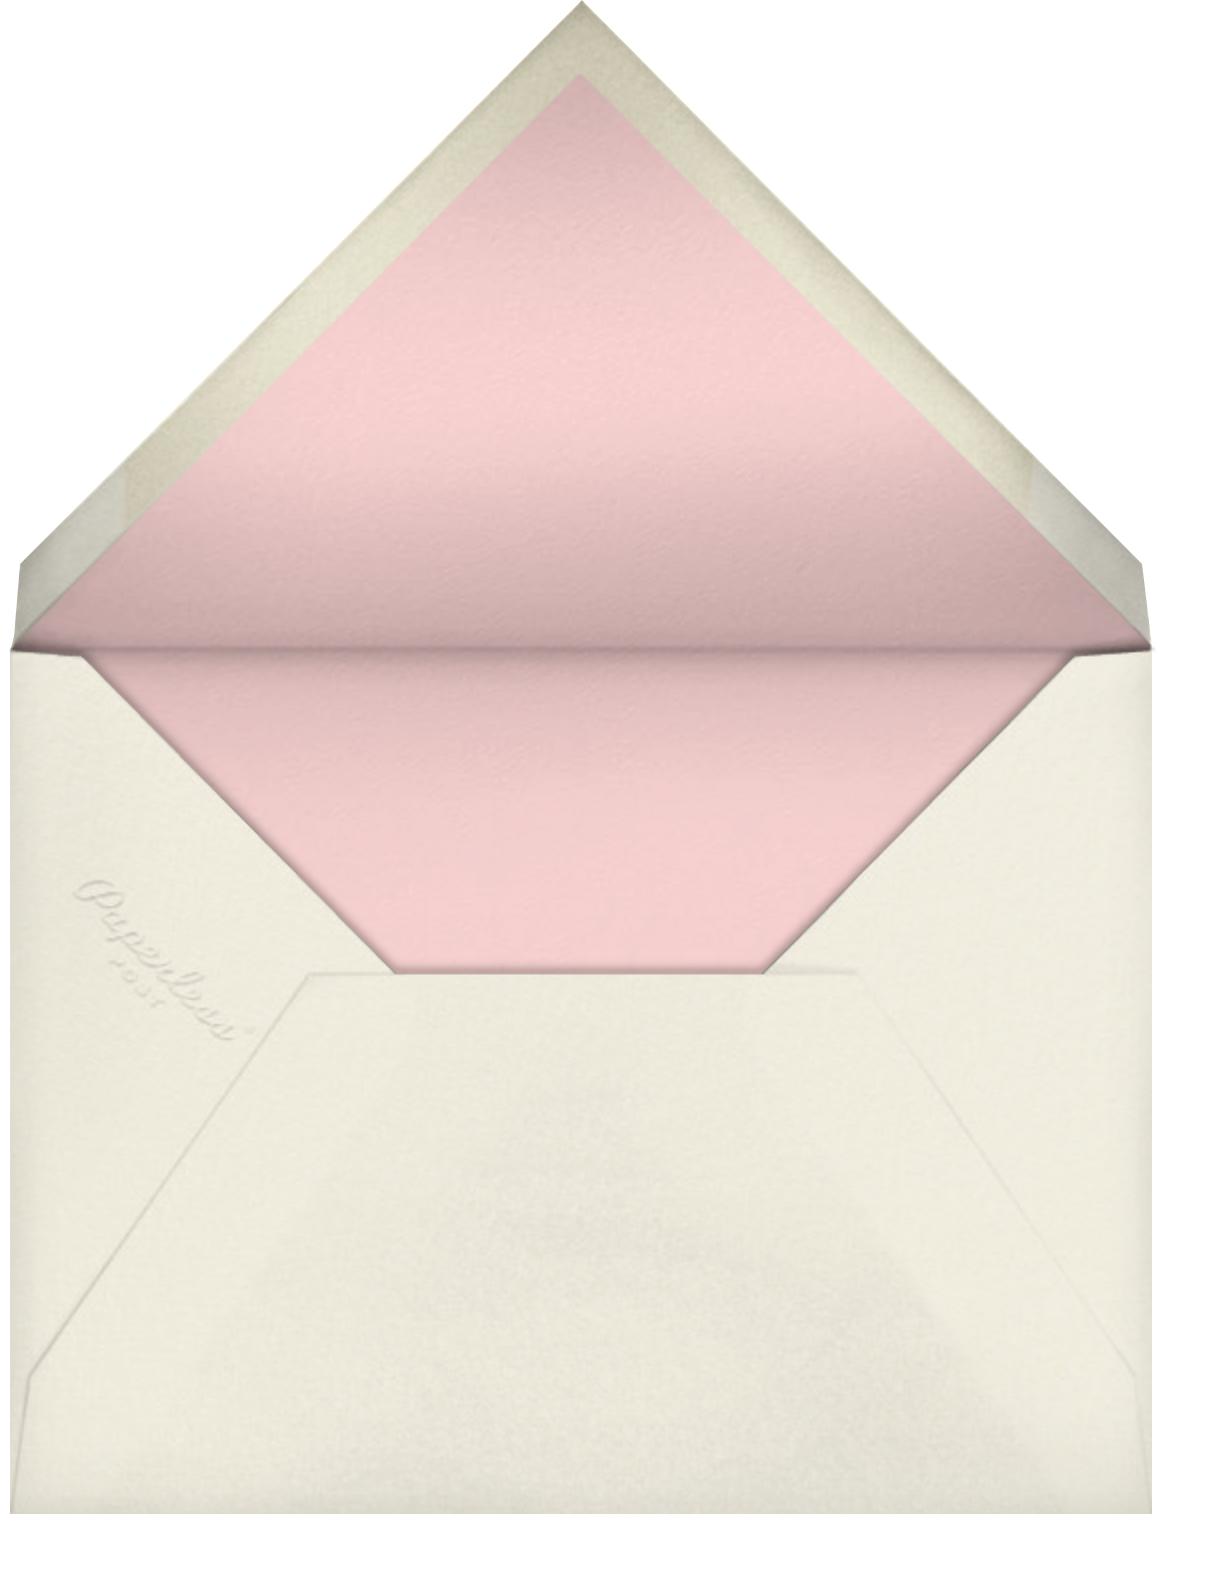 Better Halves - Pink/Paella - kate spade new york - Bridal shower - envelope back